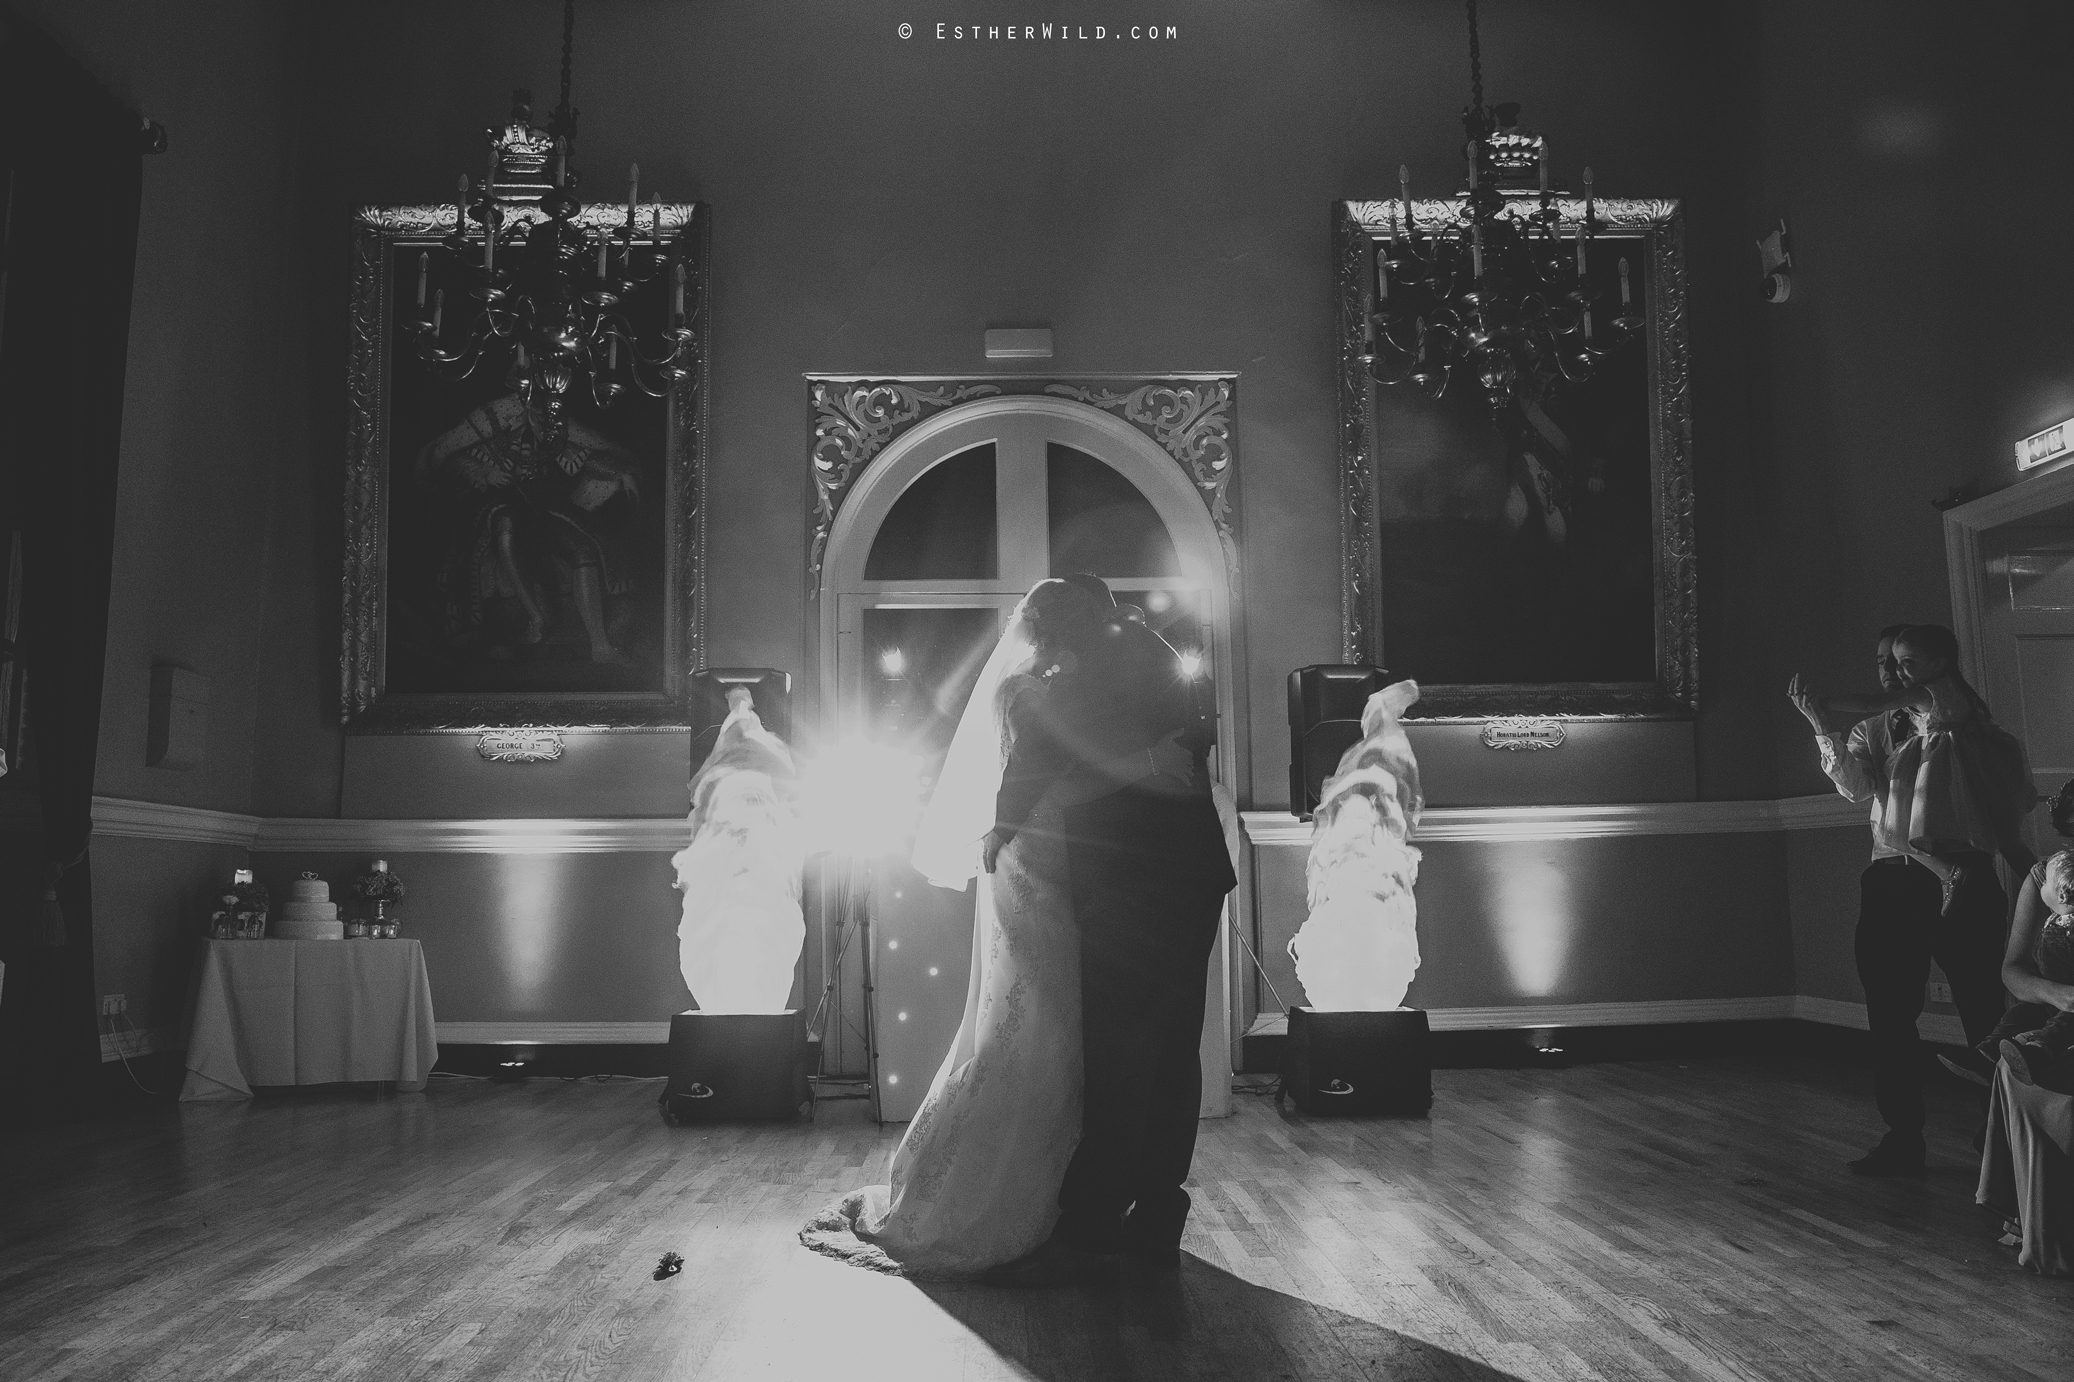 Wedding_Kings_Lynn_Town_Hall_Norfolk_Photographer_Esther_Wild_IMG_1825_IMGL0774.jpg